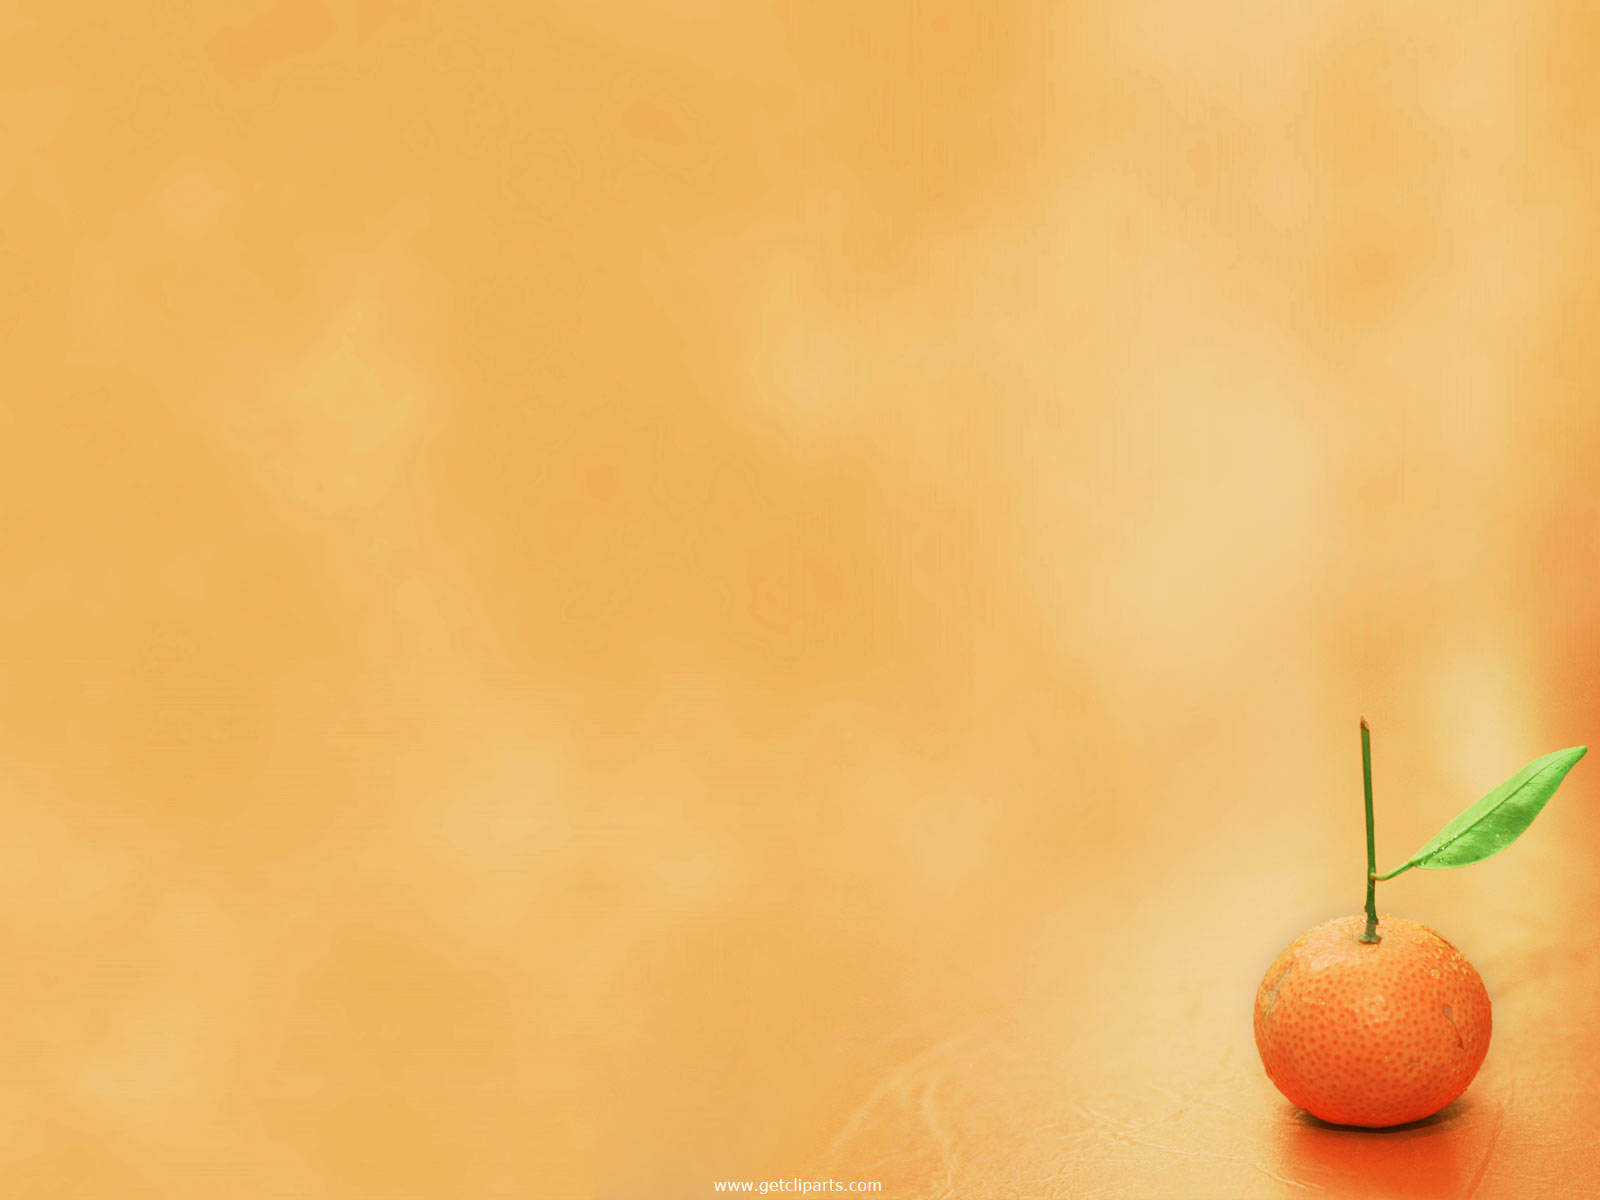 desktop orange wallpapers orange wallpaper orange background hd 17jpg 1600x1200